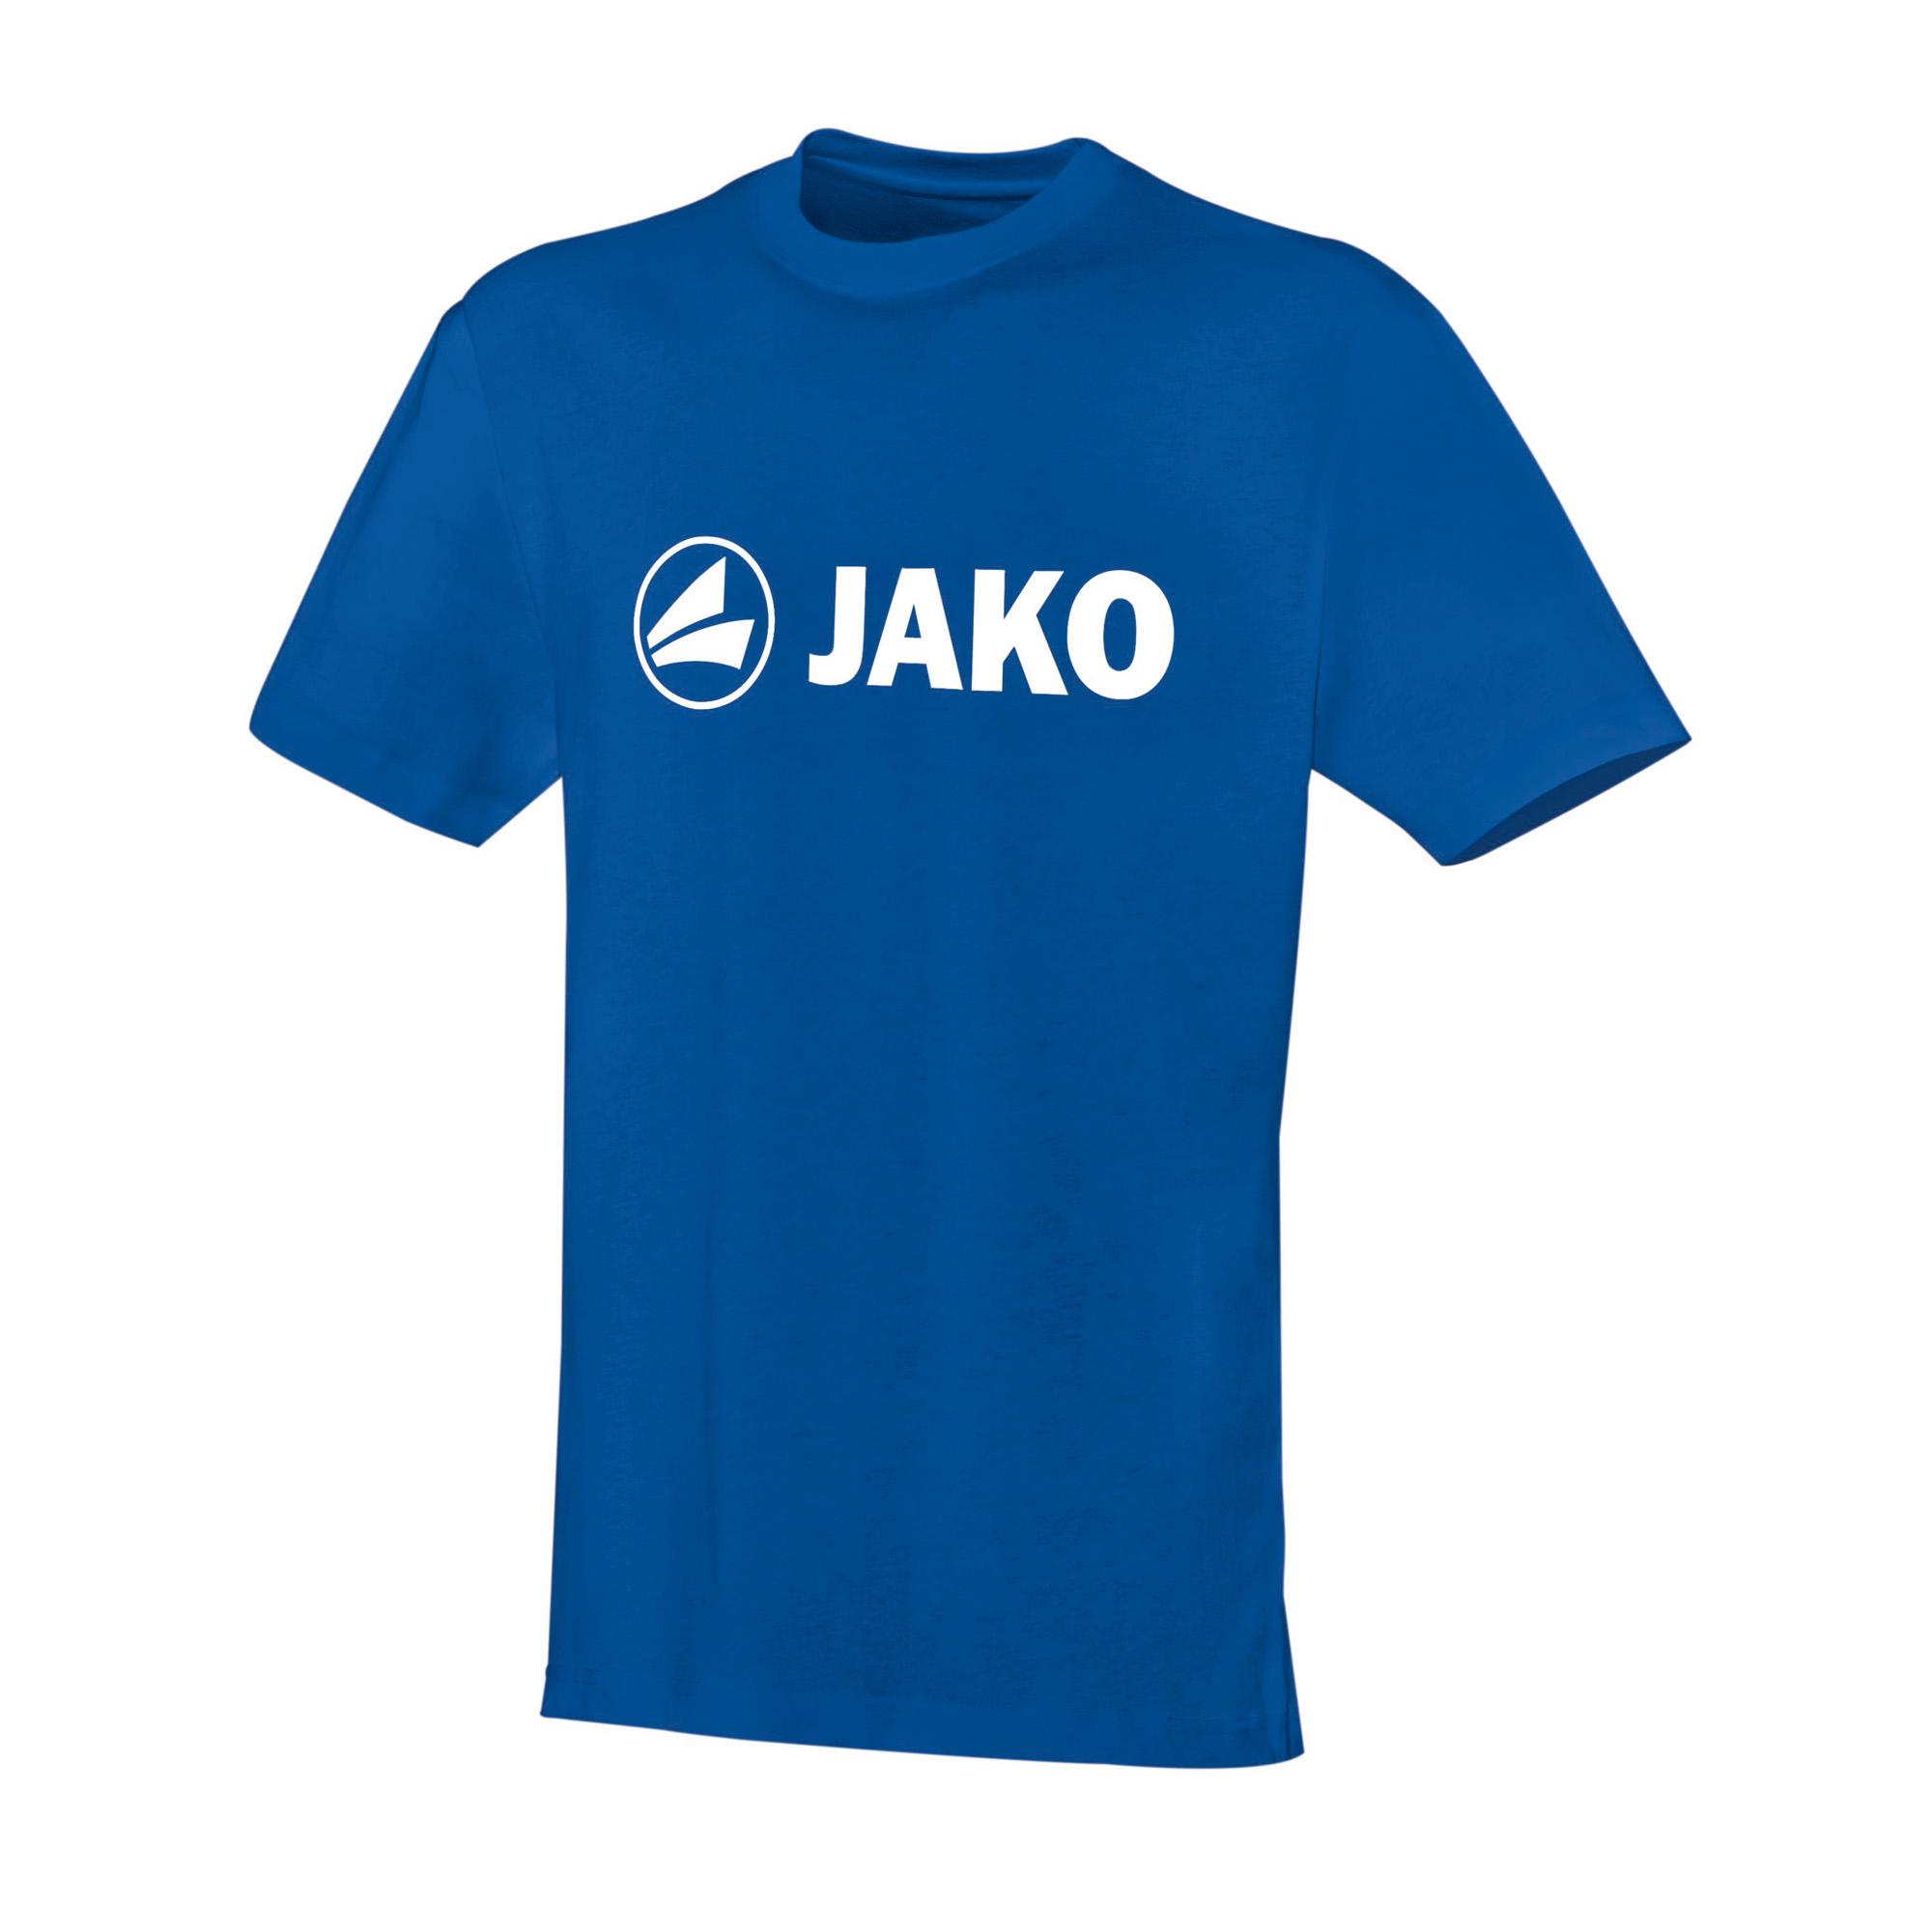 Jako Kinder T-Shirt Promo 6163-04 164